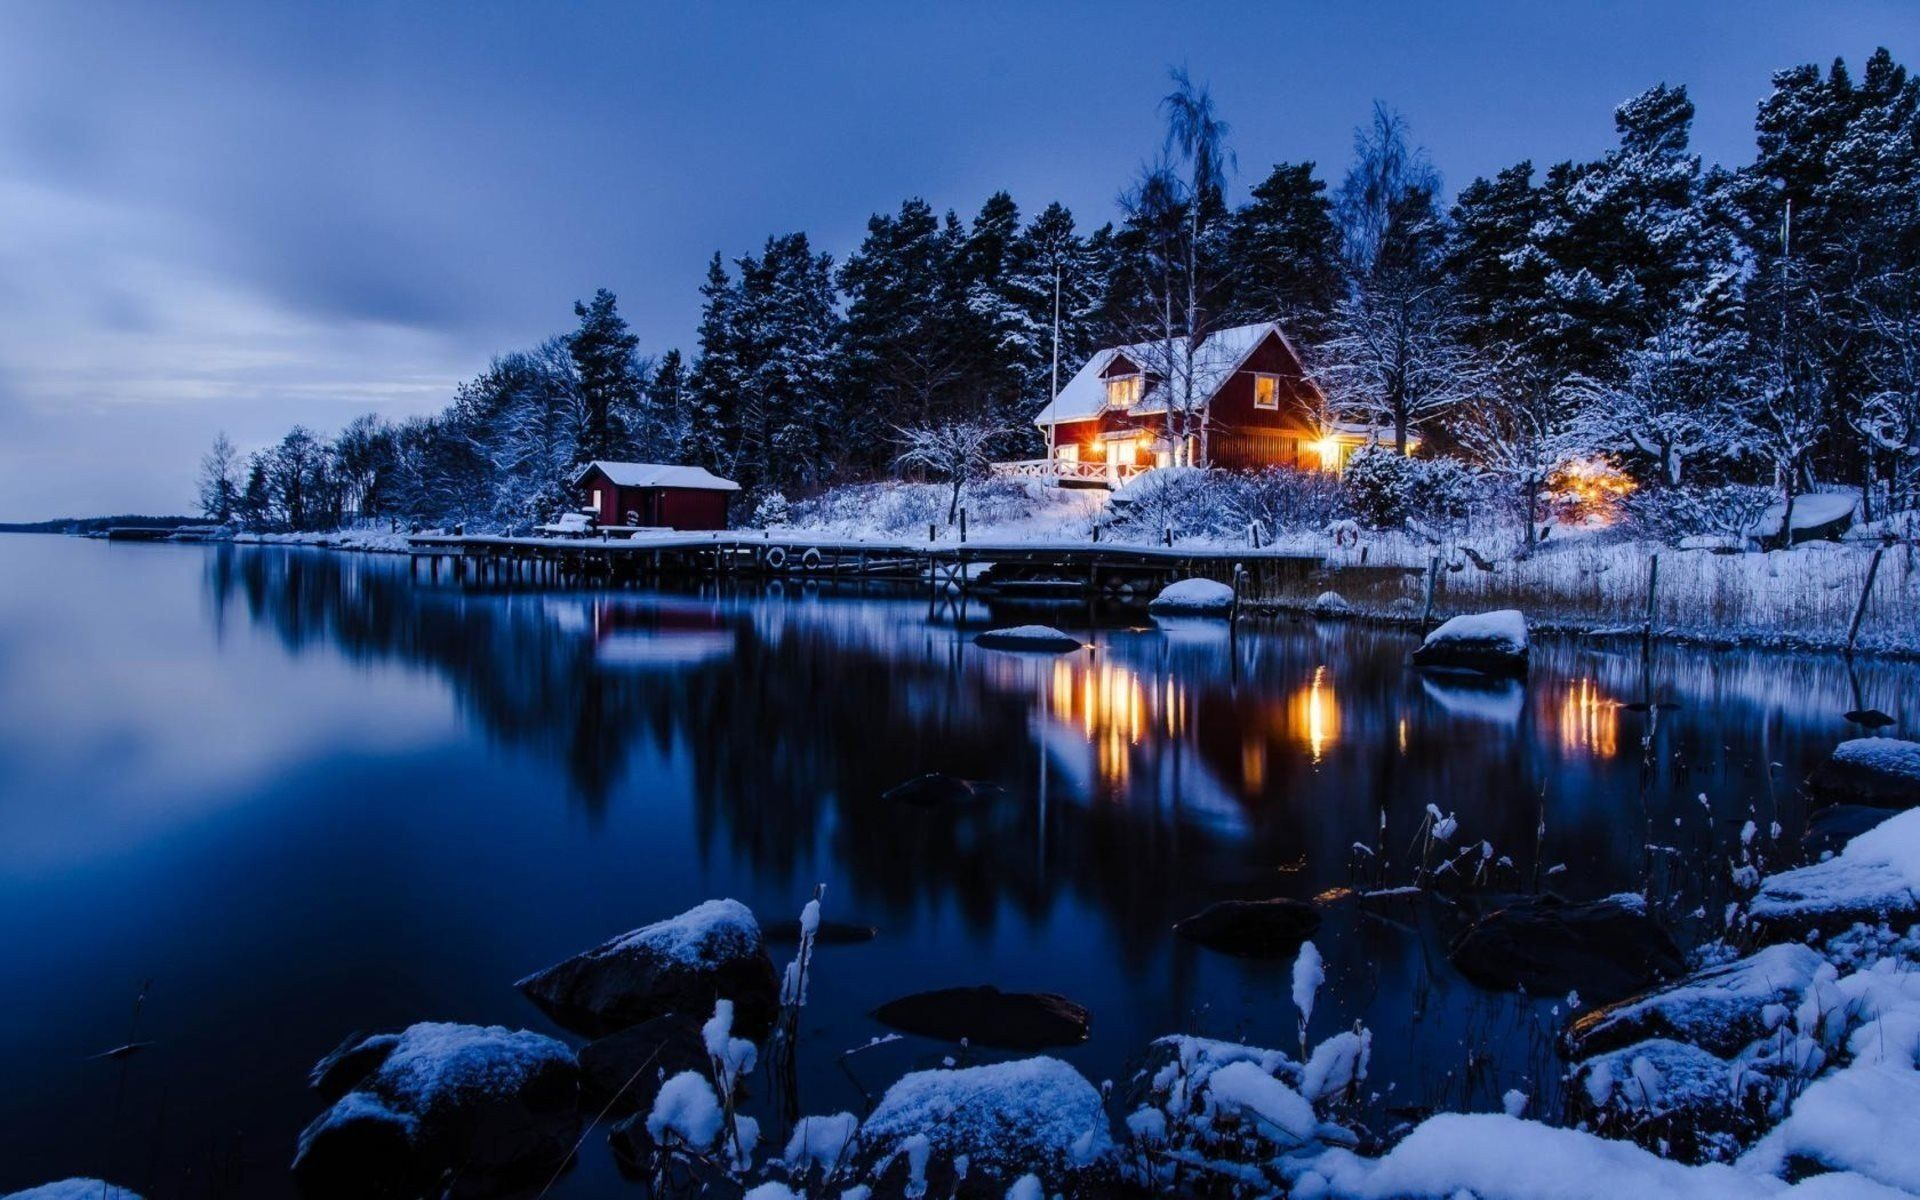 Forest Sweden House の画像検索結果 冬の風景 冬の壁紙 美しい風景